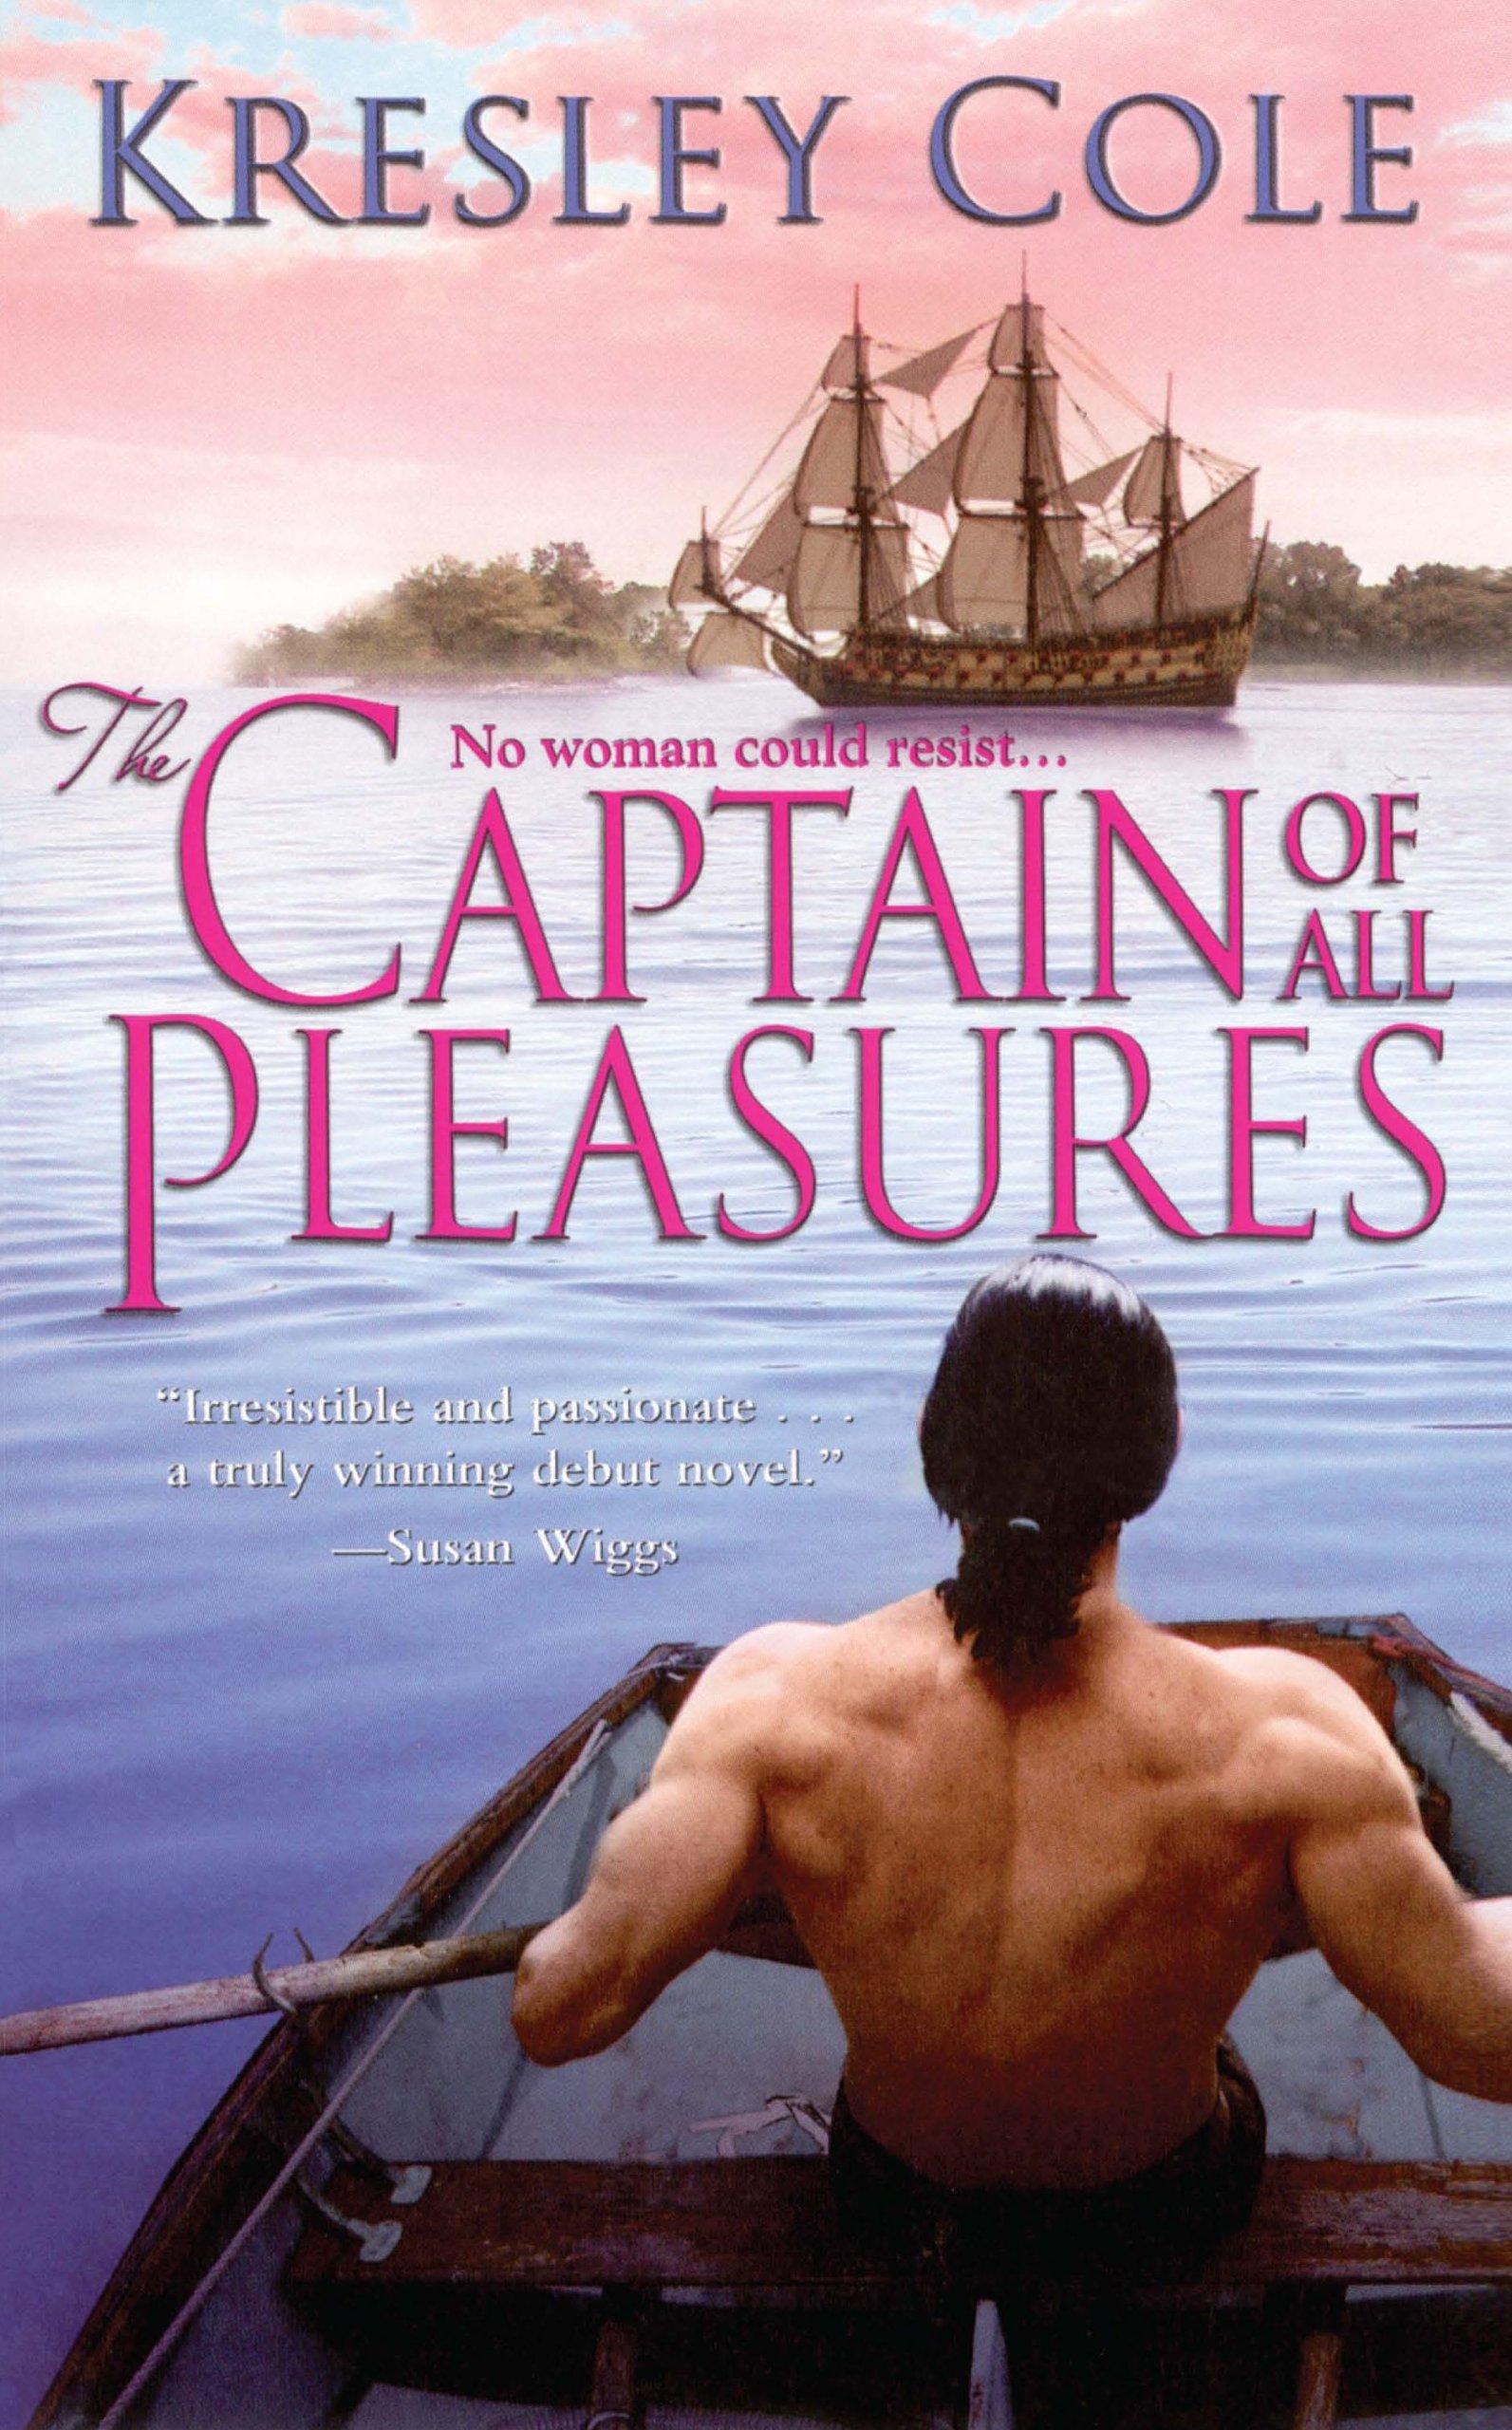 The Captain of All Pleasures: Kresley Cole: 9781476752556: Amazon.com: Books